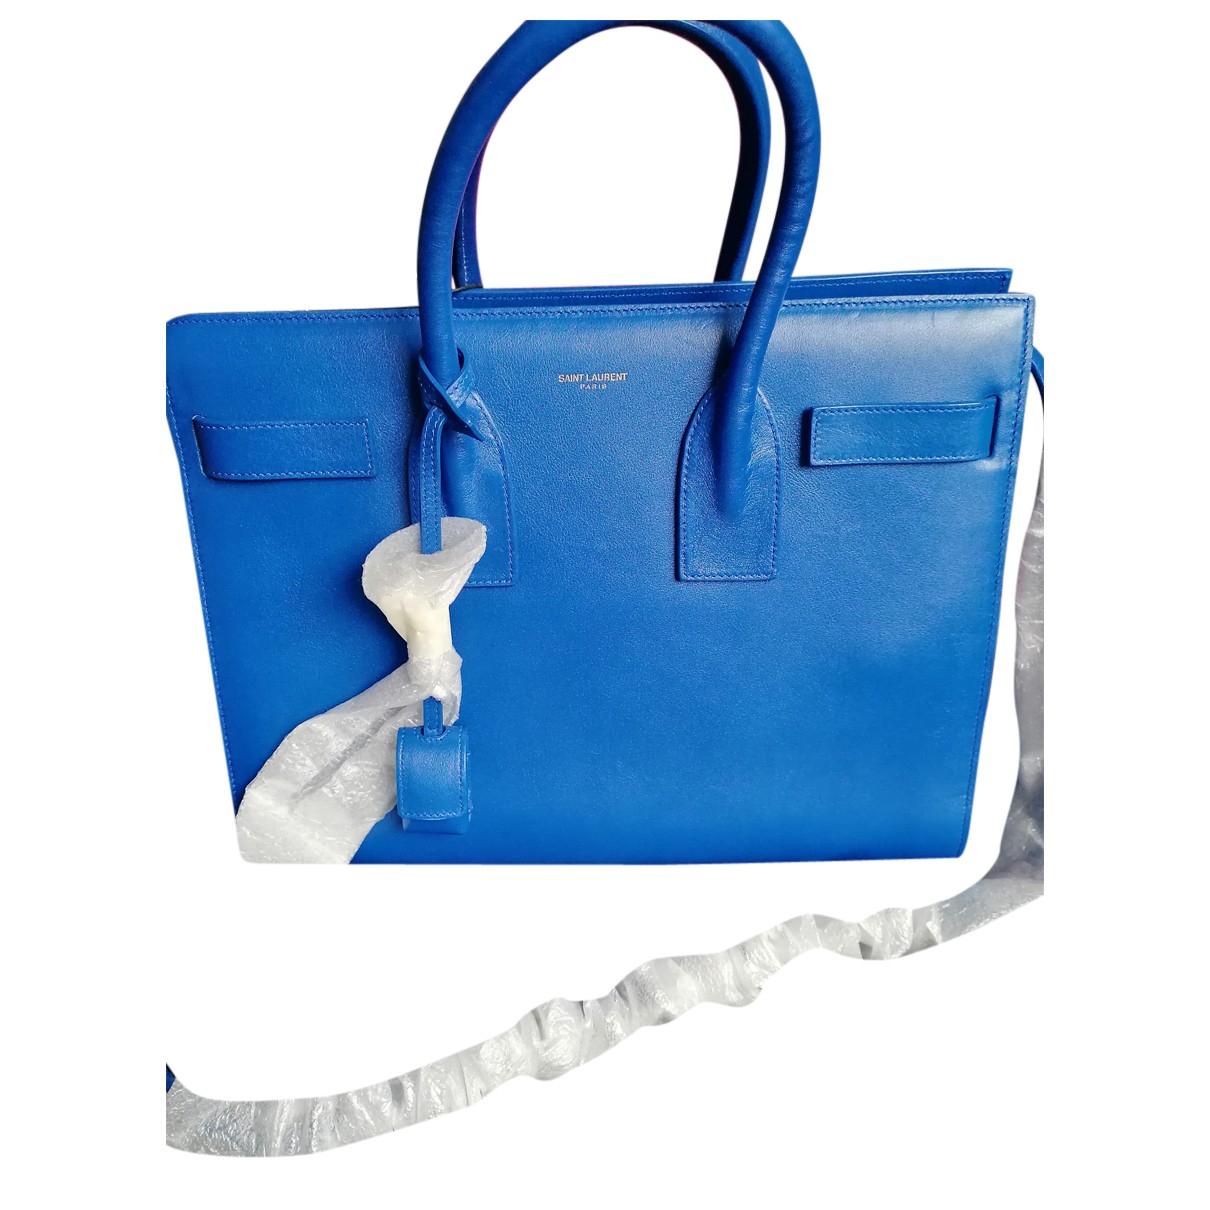 Saint Laurent Jane Handtasche in  Blau Leder